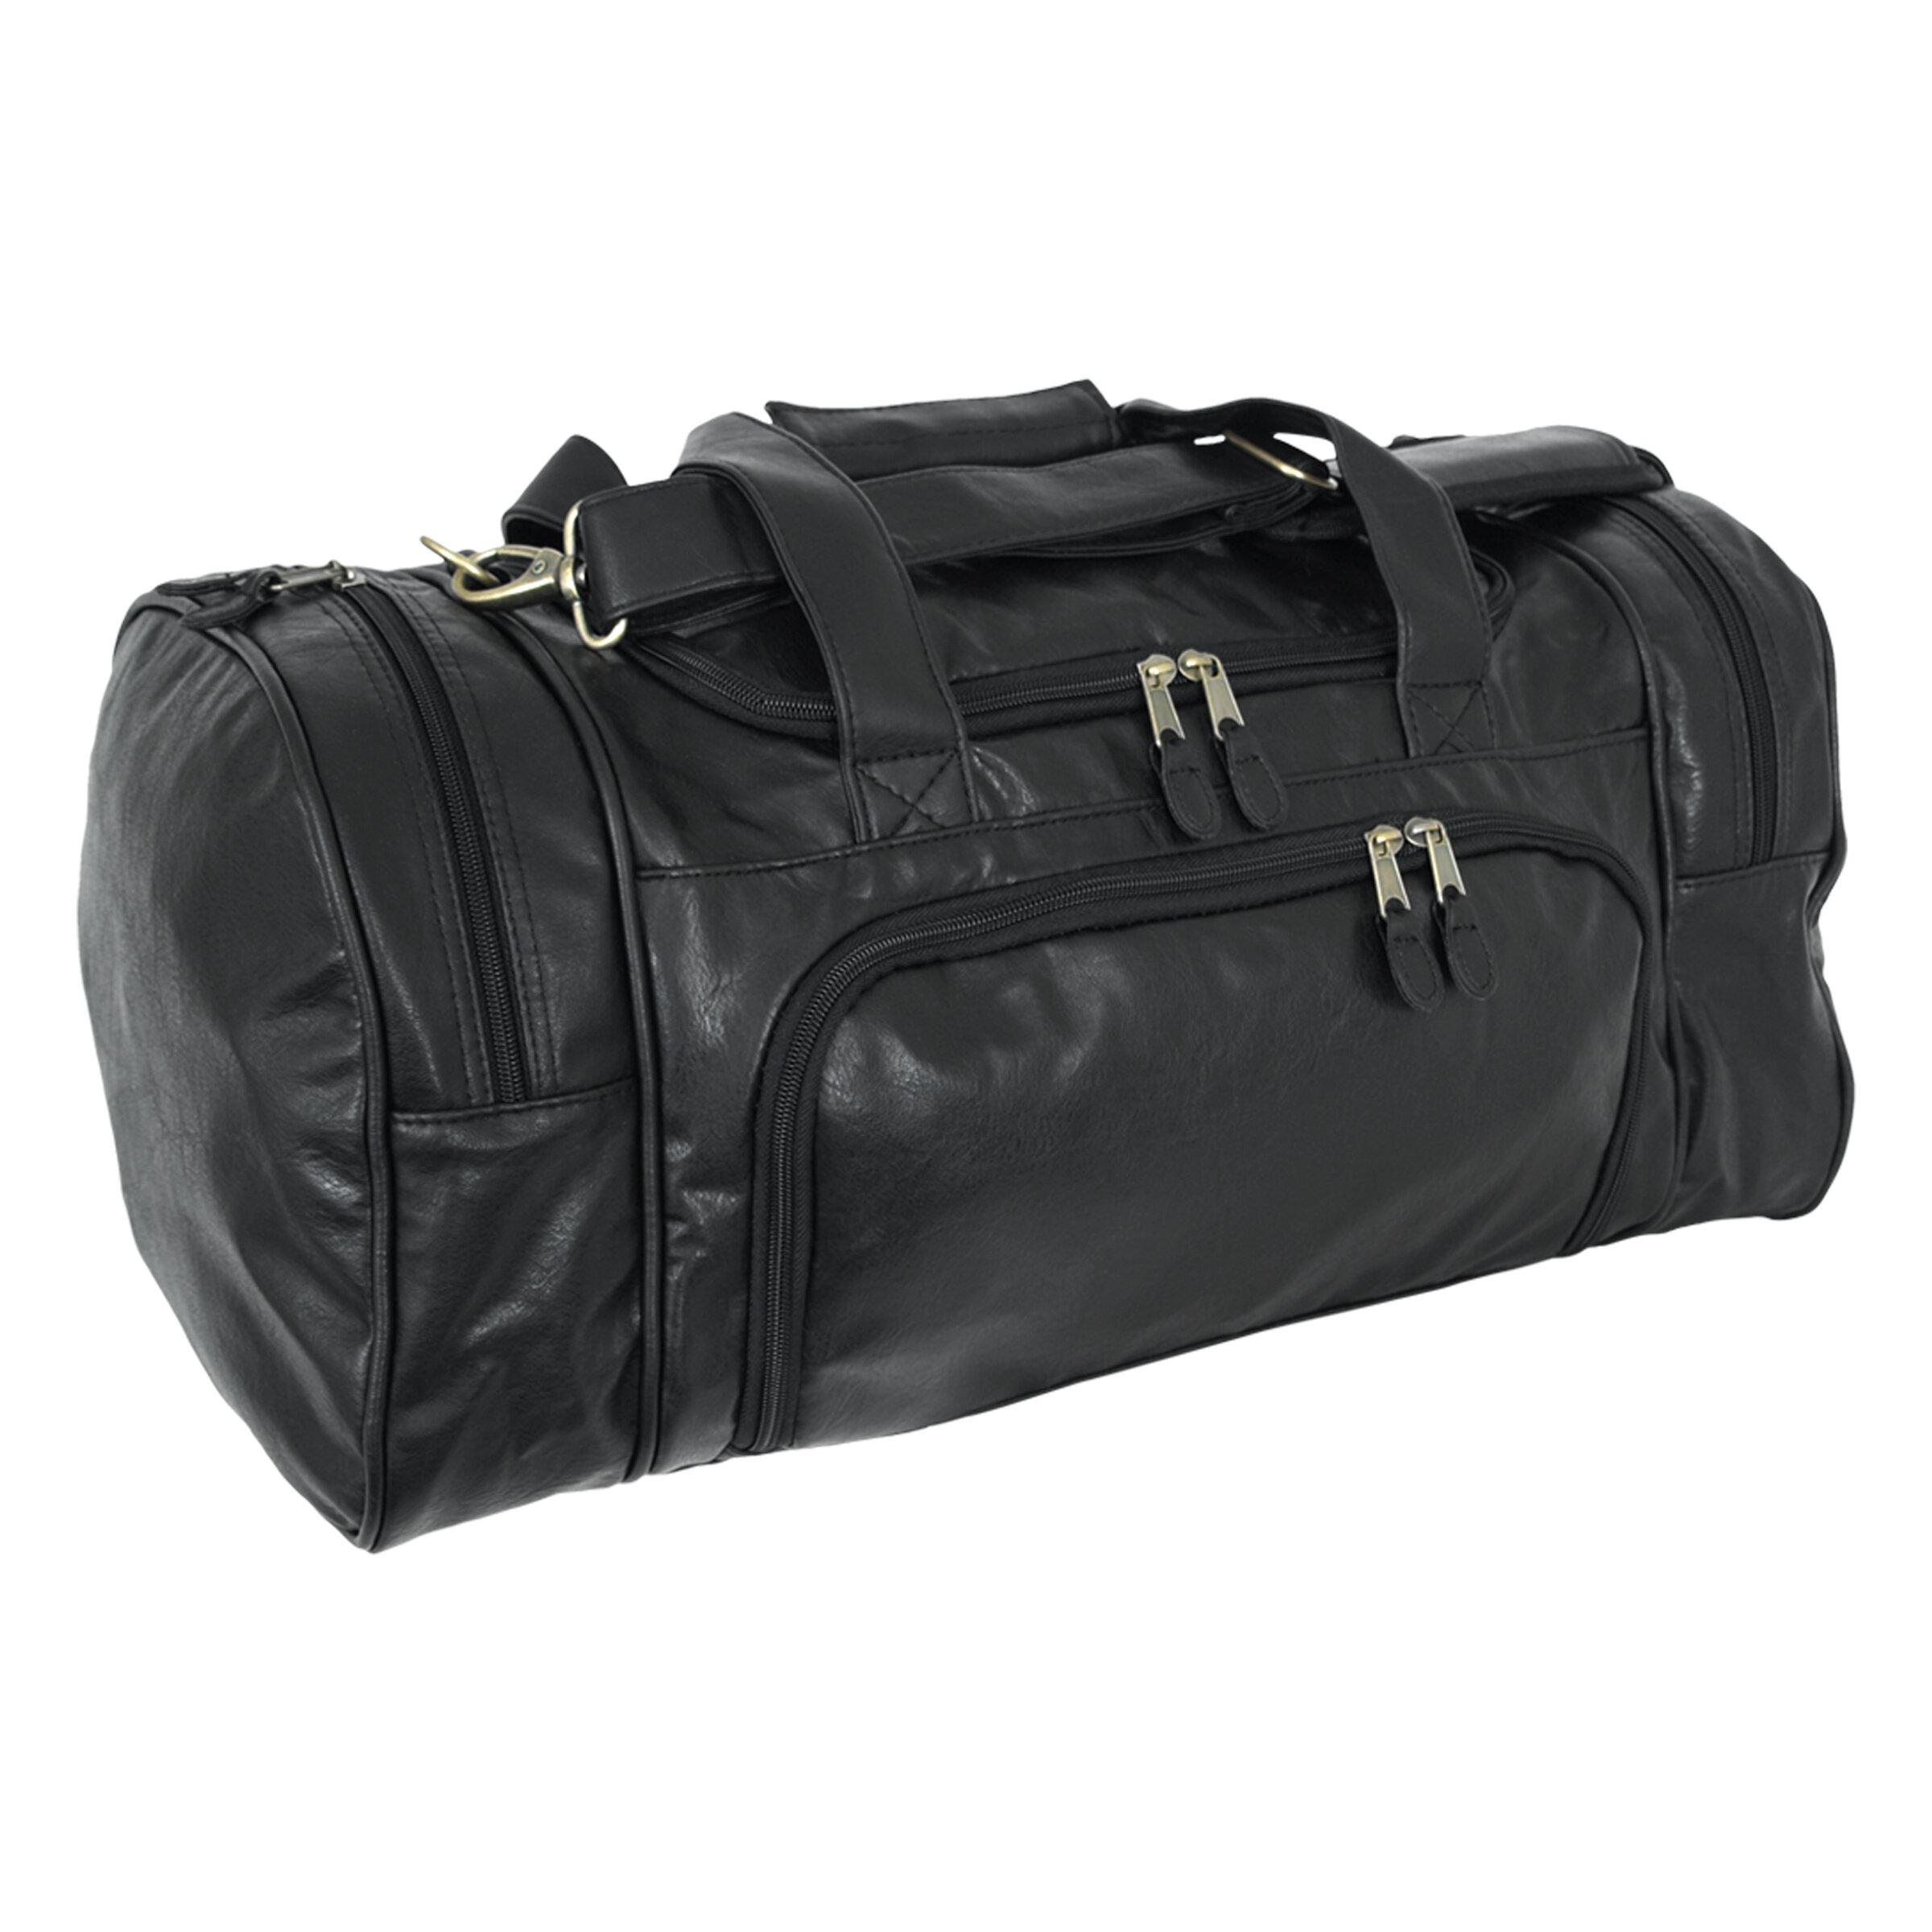 Amerileather APC Leather Duffel//Sports Bag,Black,US